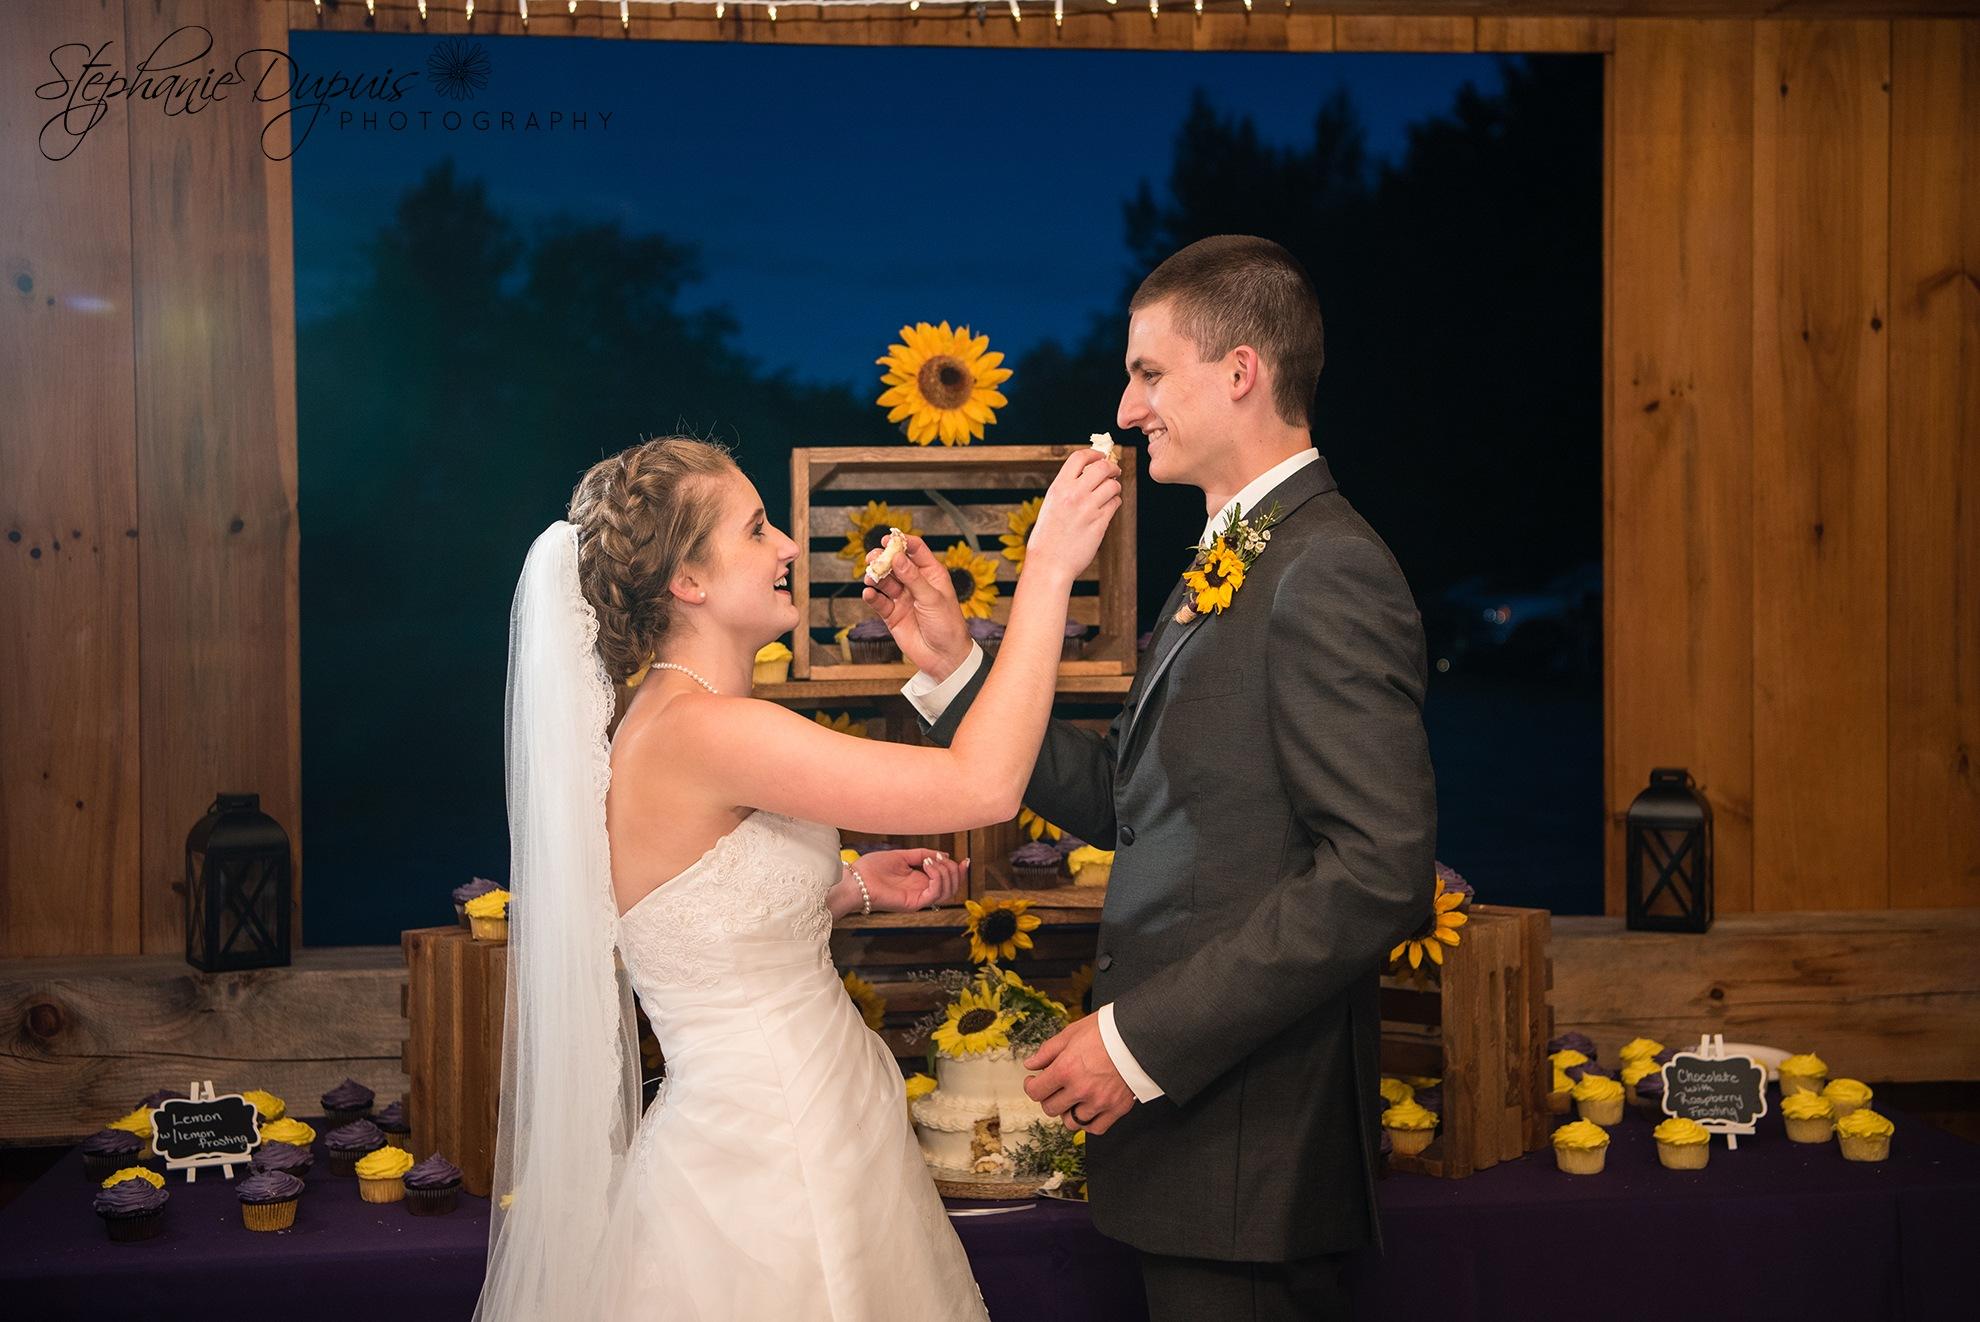 Littleton Wedding Photographer 04 - Portfolio: Ward Wedding